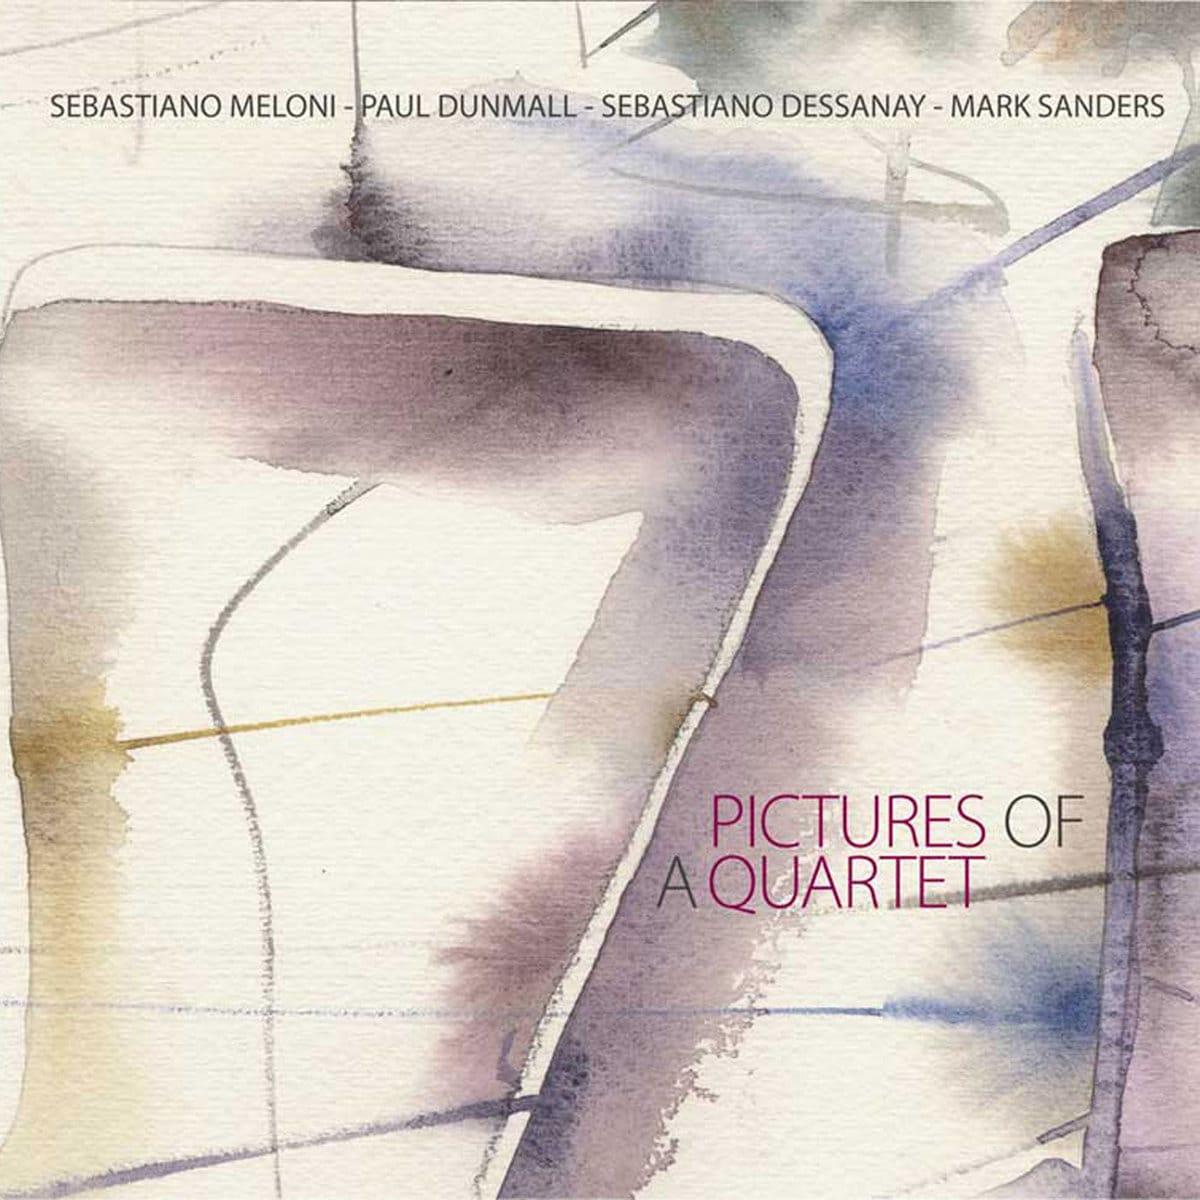 Sebastiano Dessanay Pictures of a Quartet